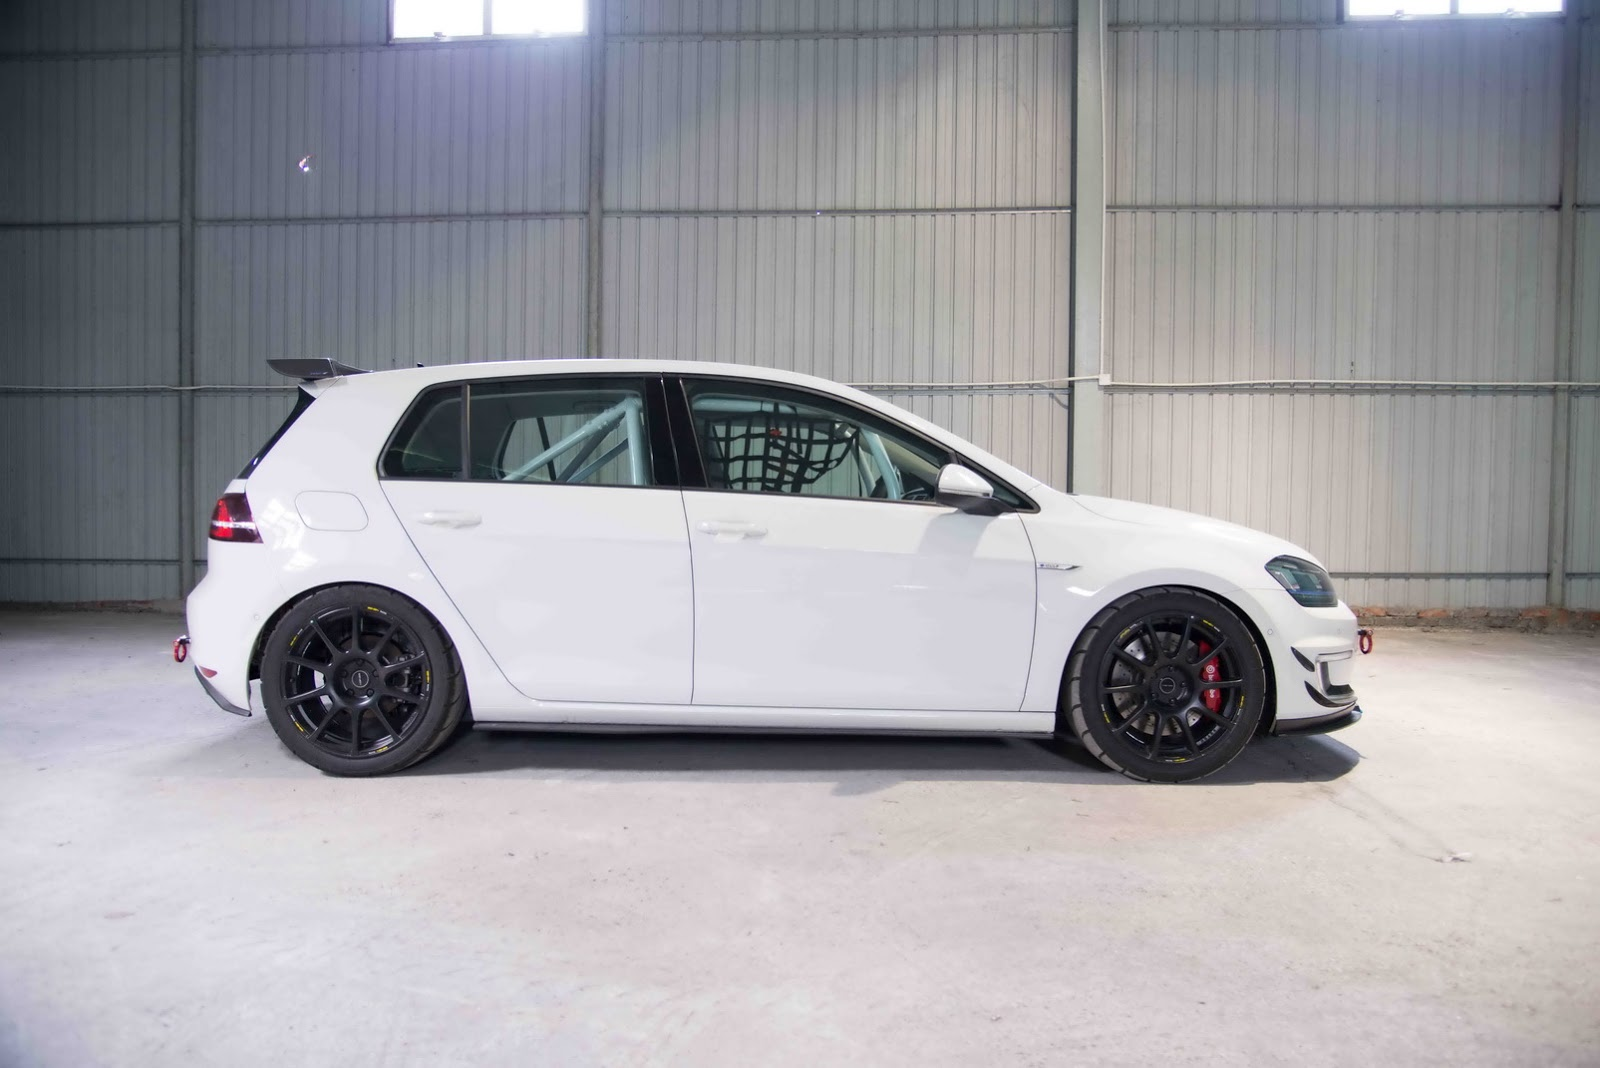 Volkswagen_e-Golf_Razor_7E_by_RevoZport_09